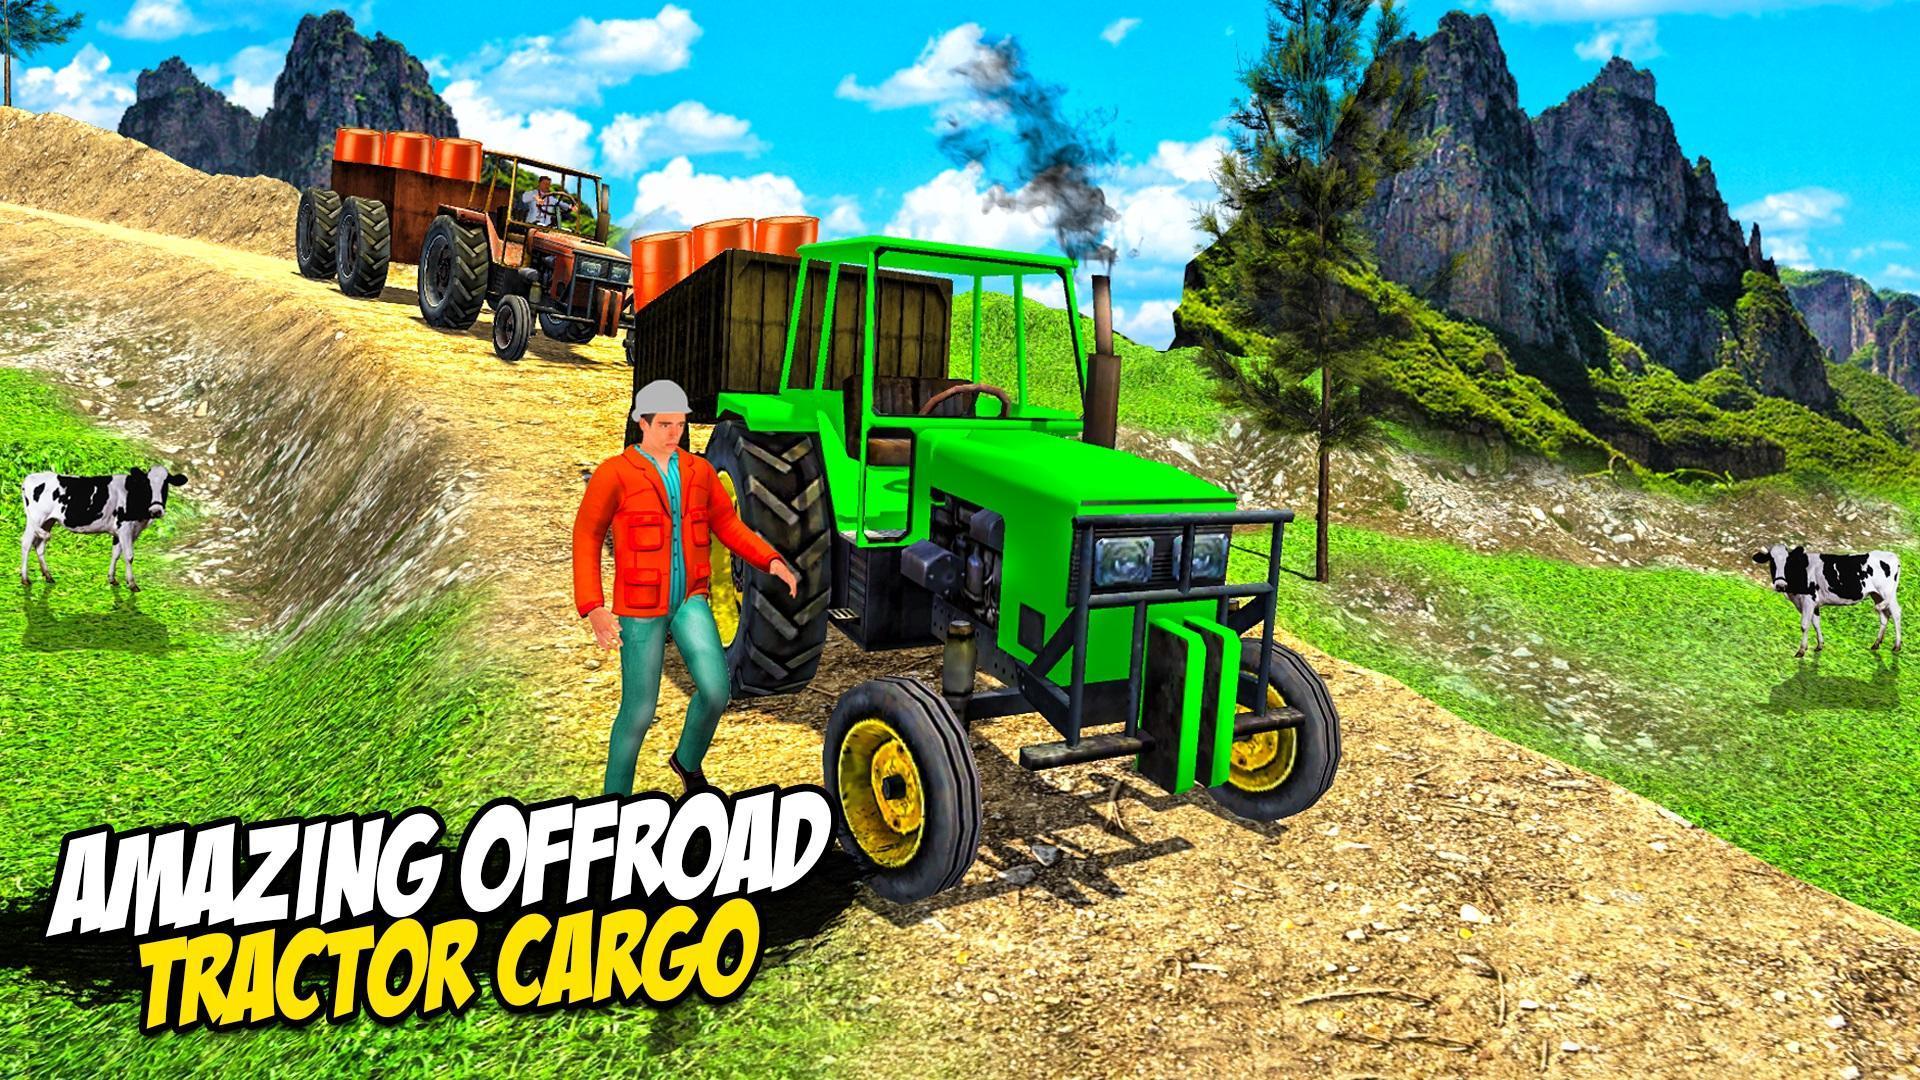 Heavy Tractor Trolley: Tractor Cargo Simulator🚜🚜 3.1 Screenshot 15